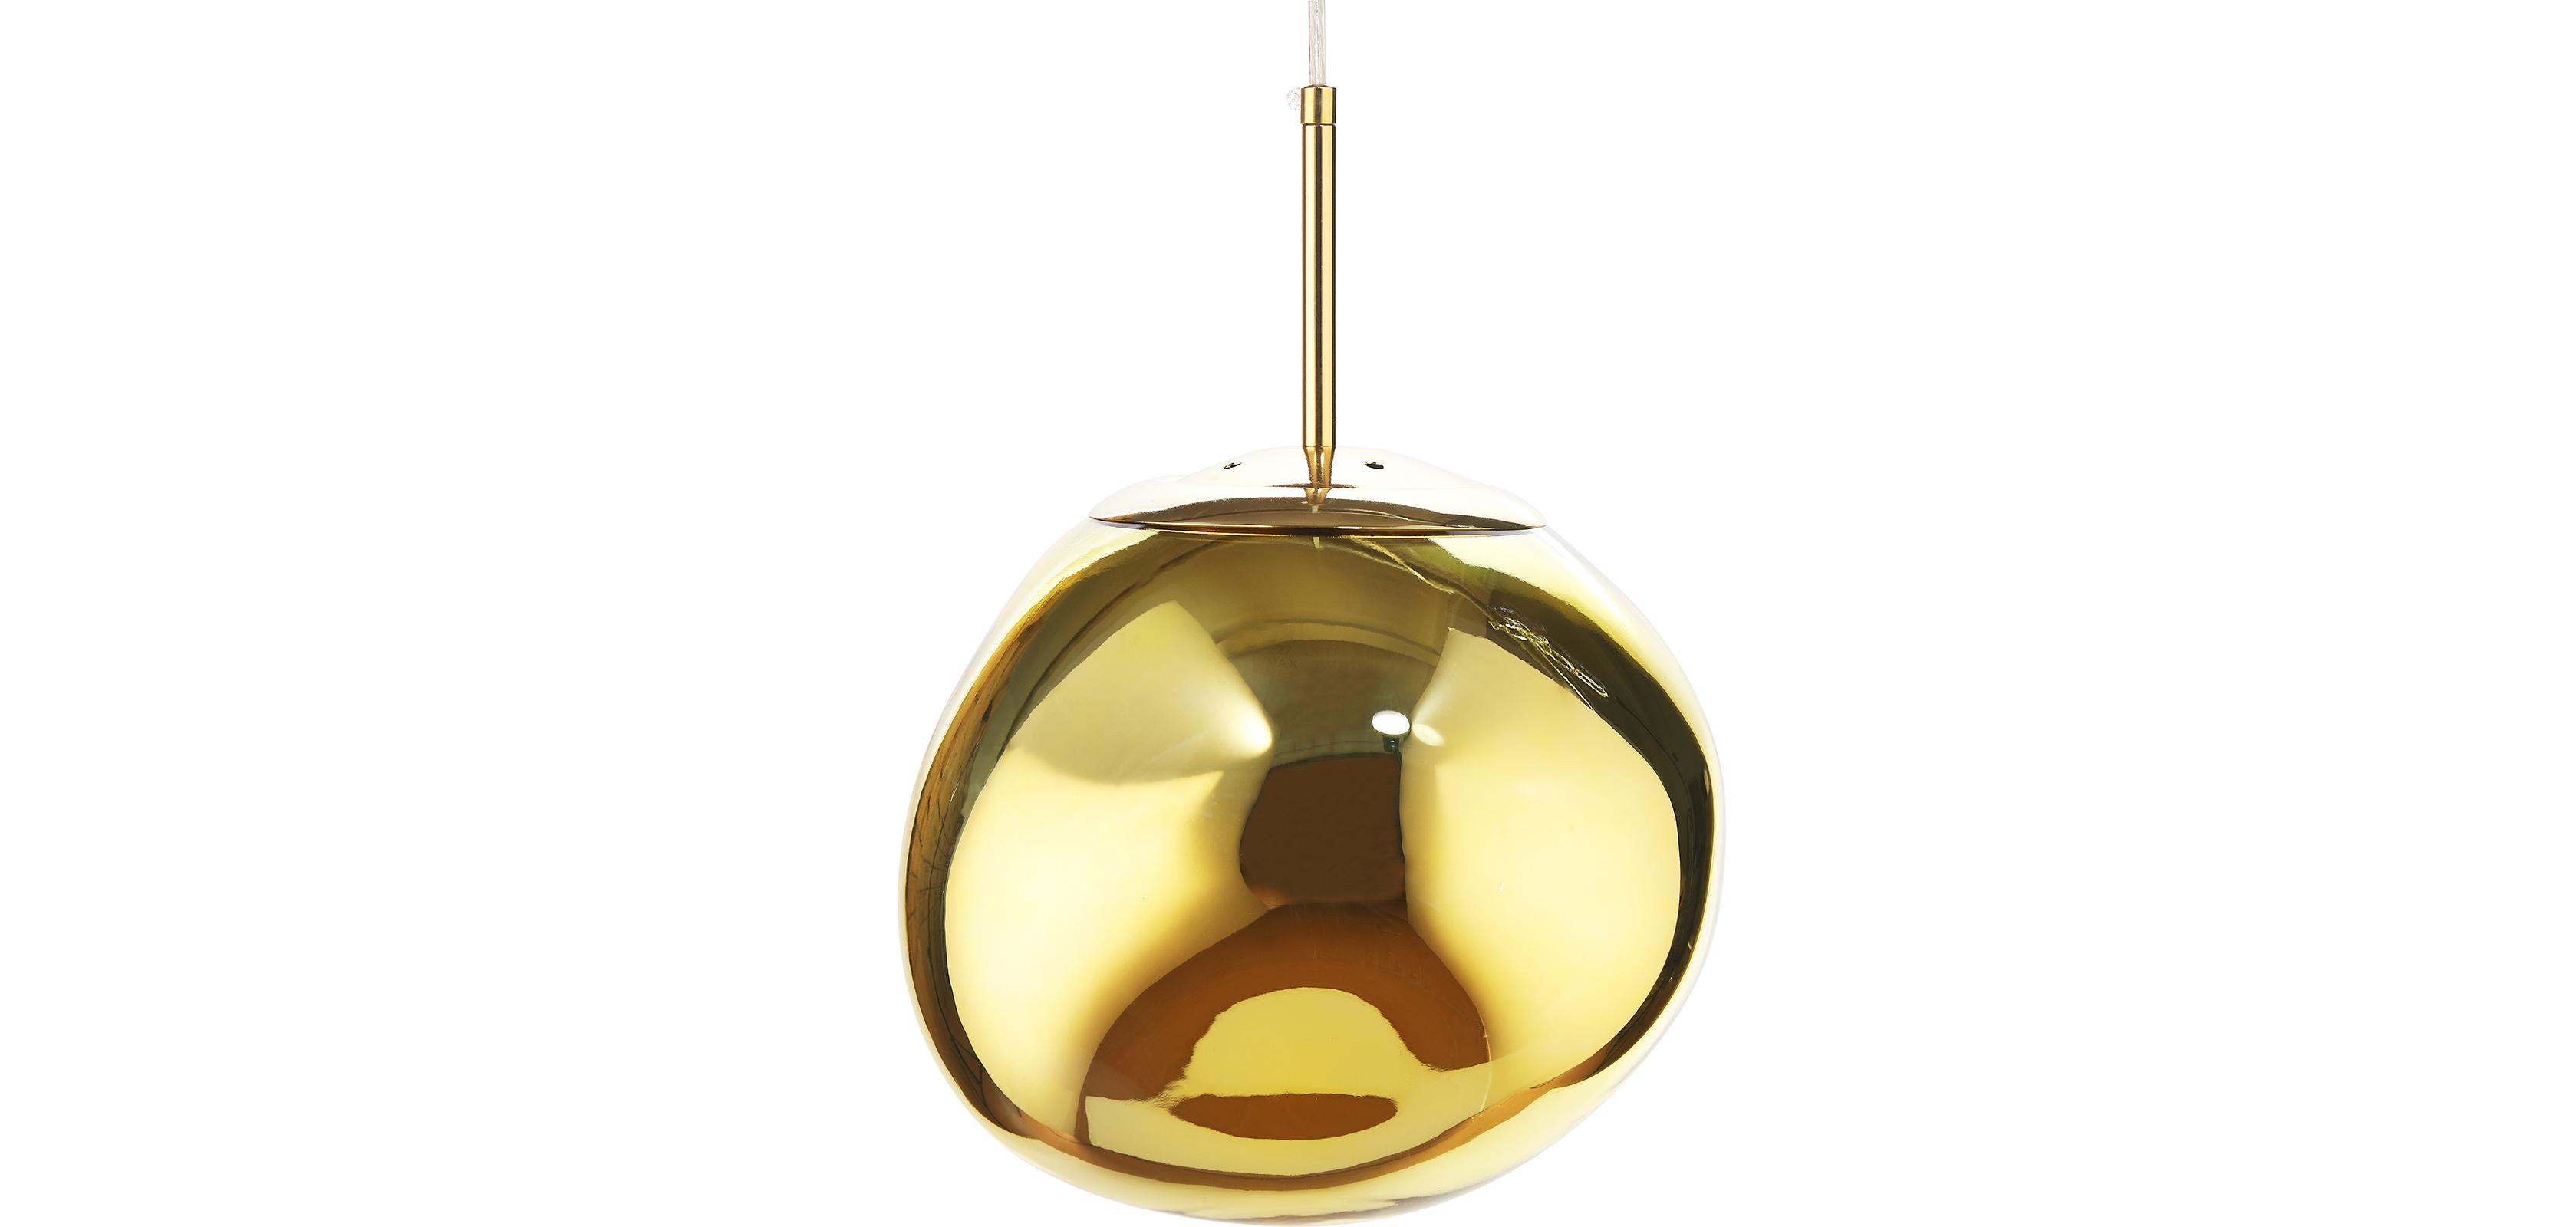 Buy Lava Design pendant lamp - Acrylic  Gold 59486 - in the UK